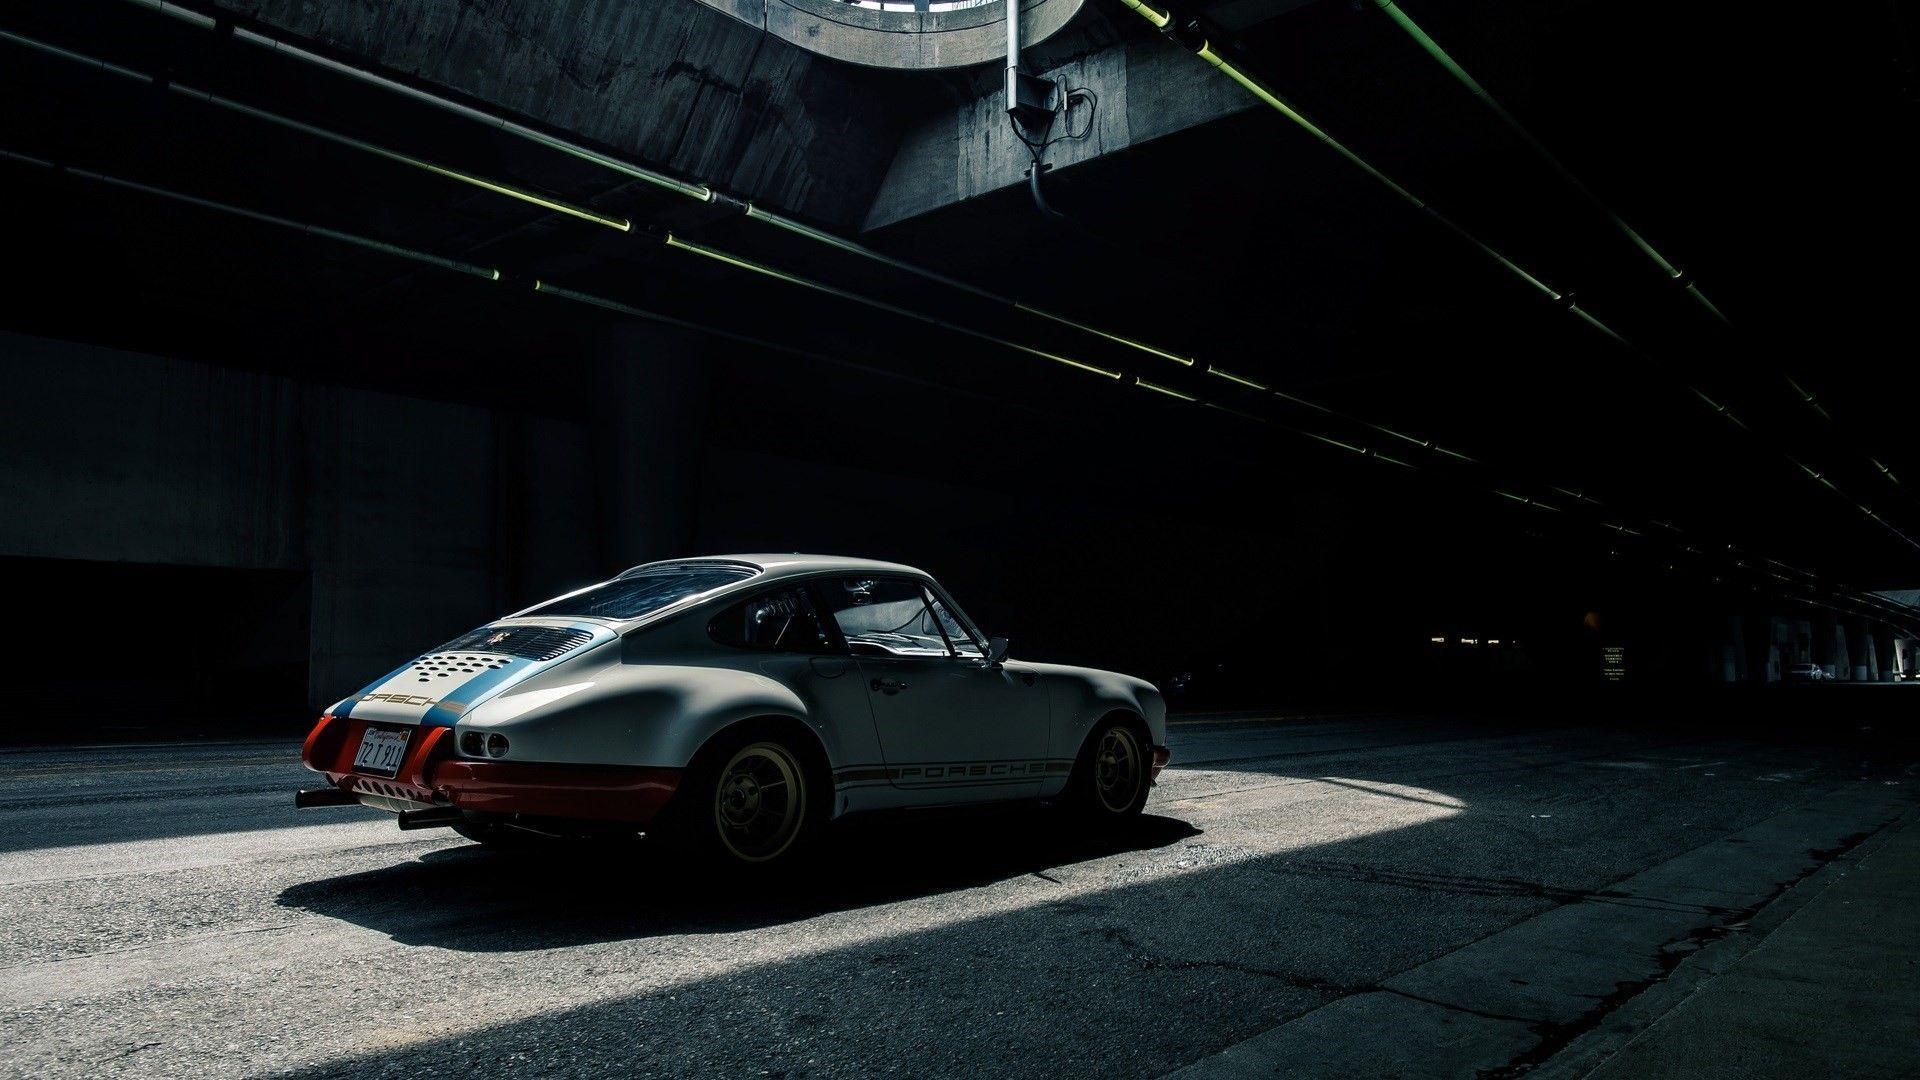 Vintage Porsche Wallpapers Top Free Vintage Porsche Backgrounds Wallpaperaccess